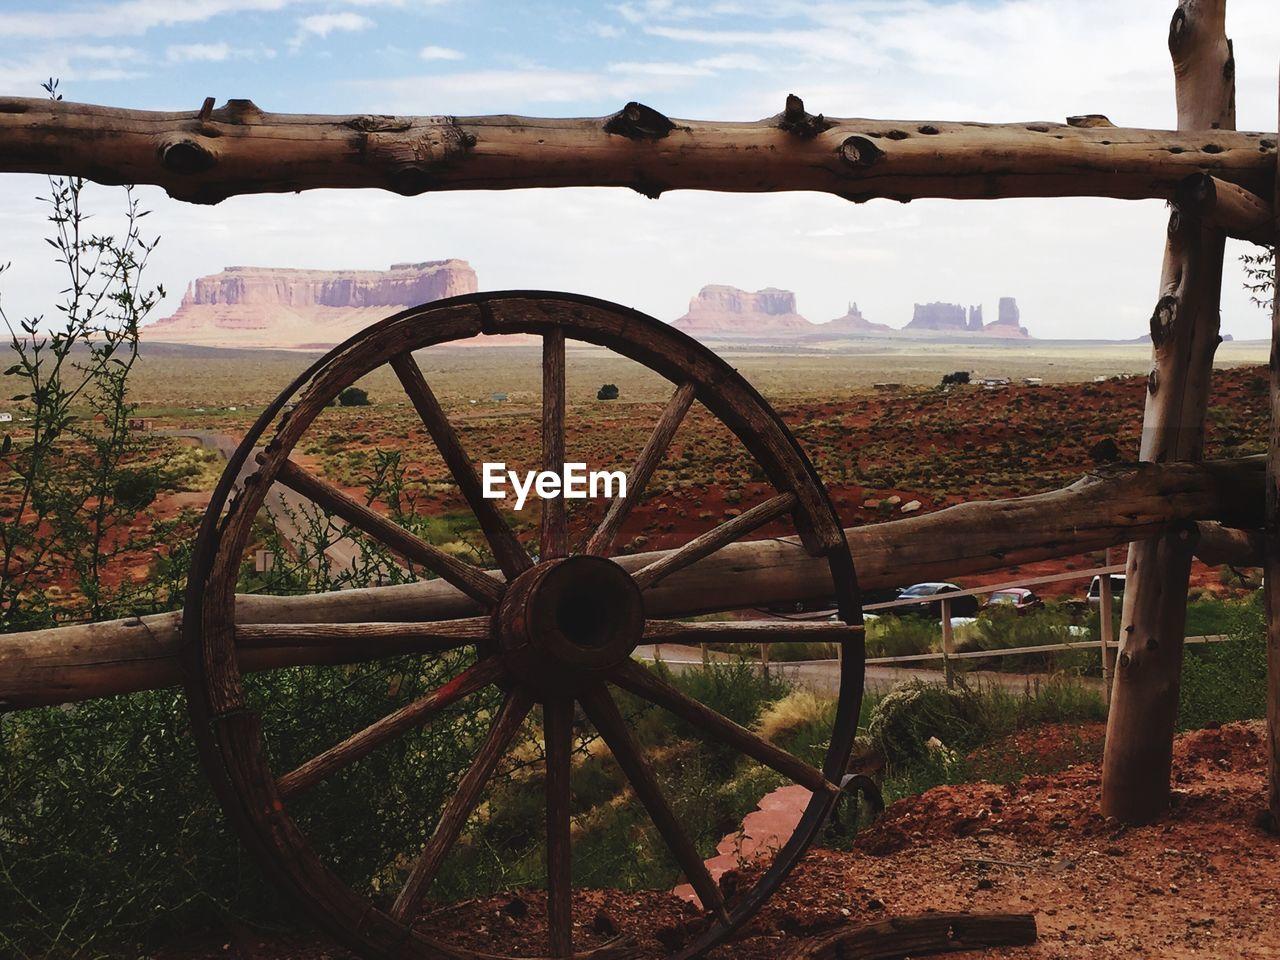 Wheel By Wooden Fence On Field Against Sky